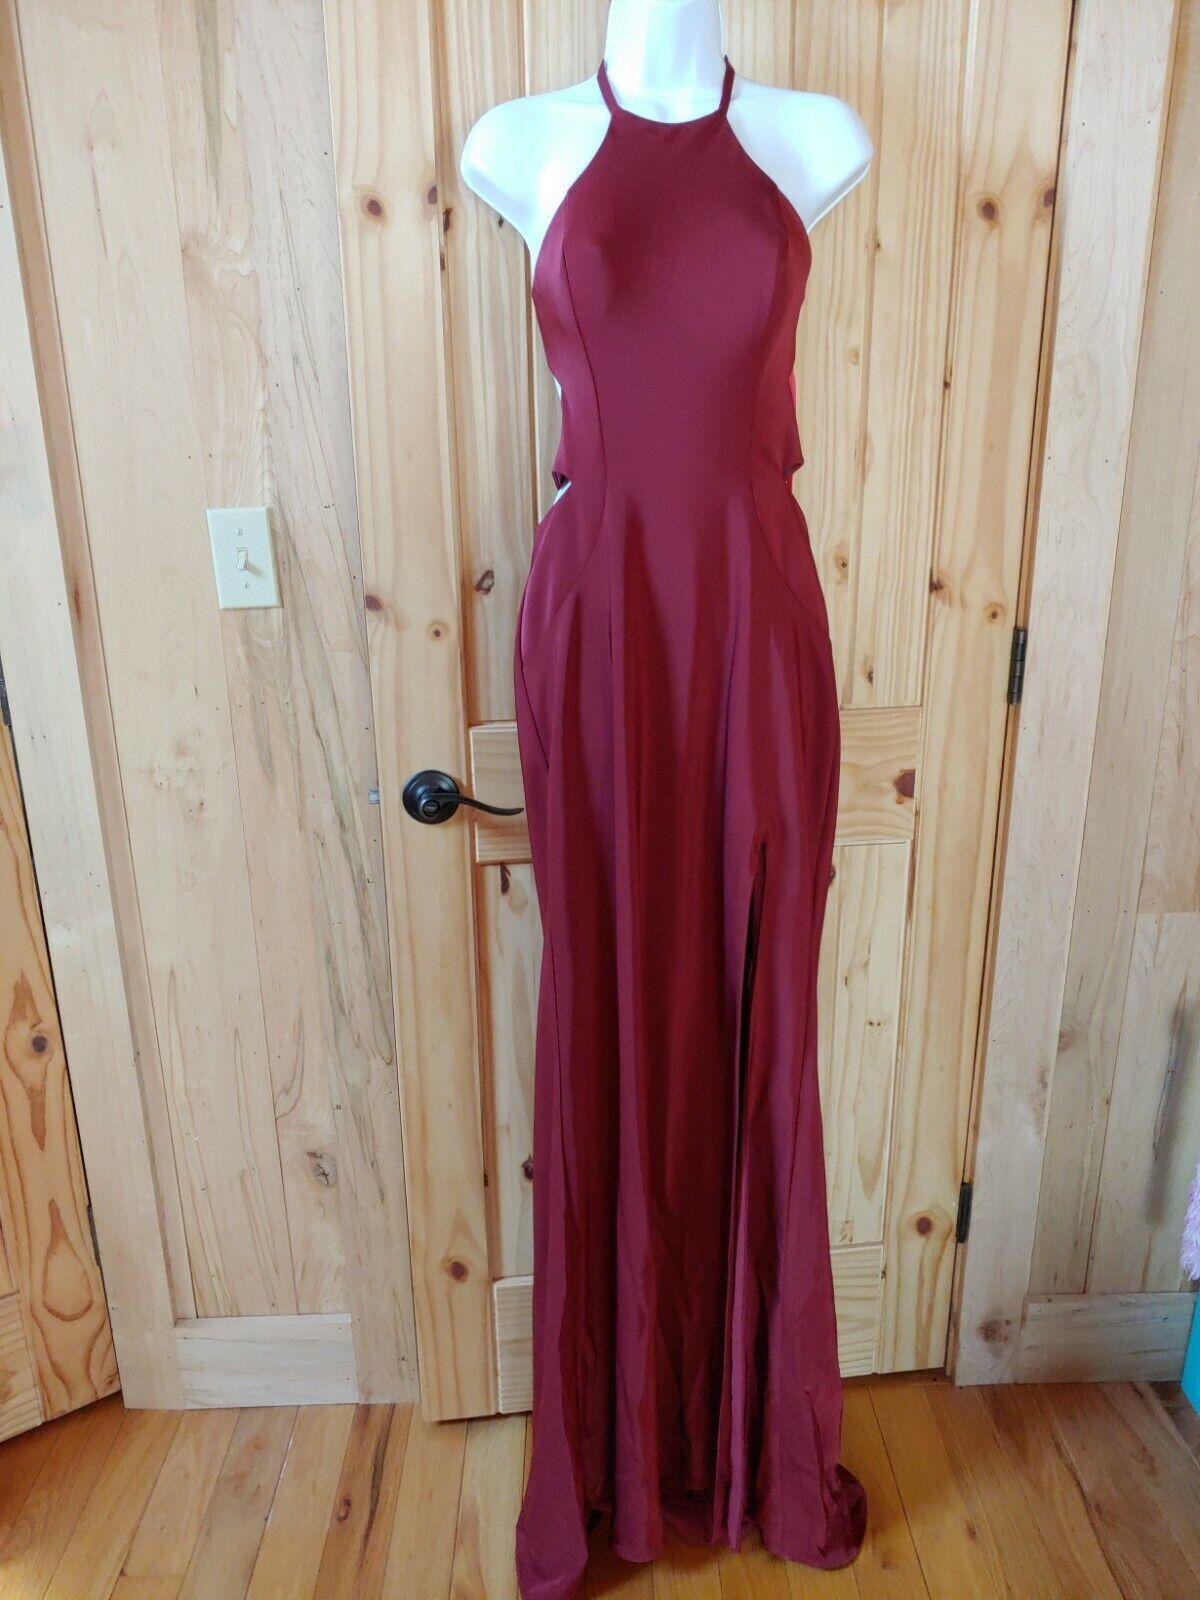 La Femme Prom Dress Formal strappy Evening Gown 24380 Burgundy Front Slit Size 6